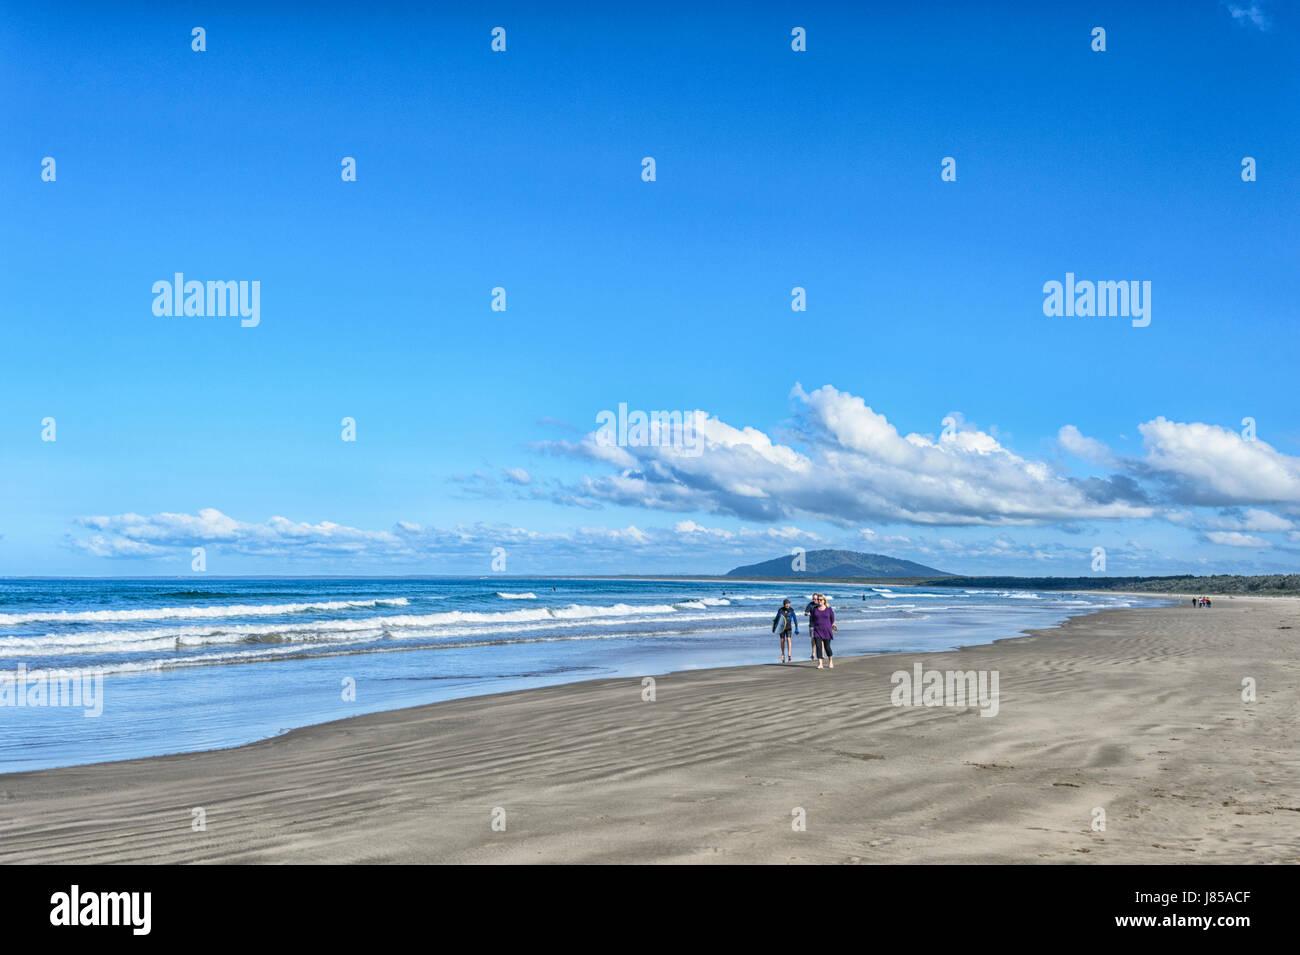 People walking on scenic 7 Mile Beach, Gerroa, New South Wales, NSW, Australia - Stock Image